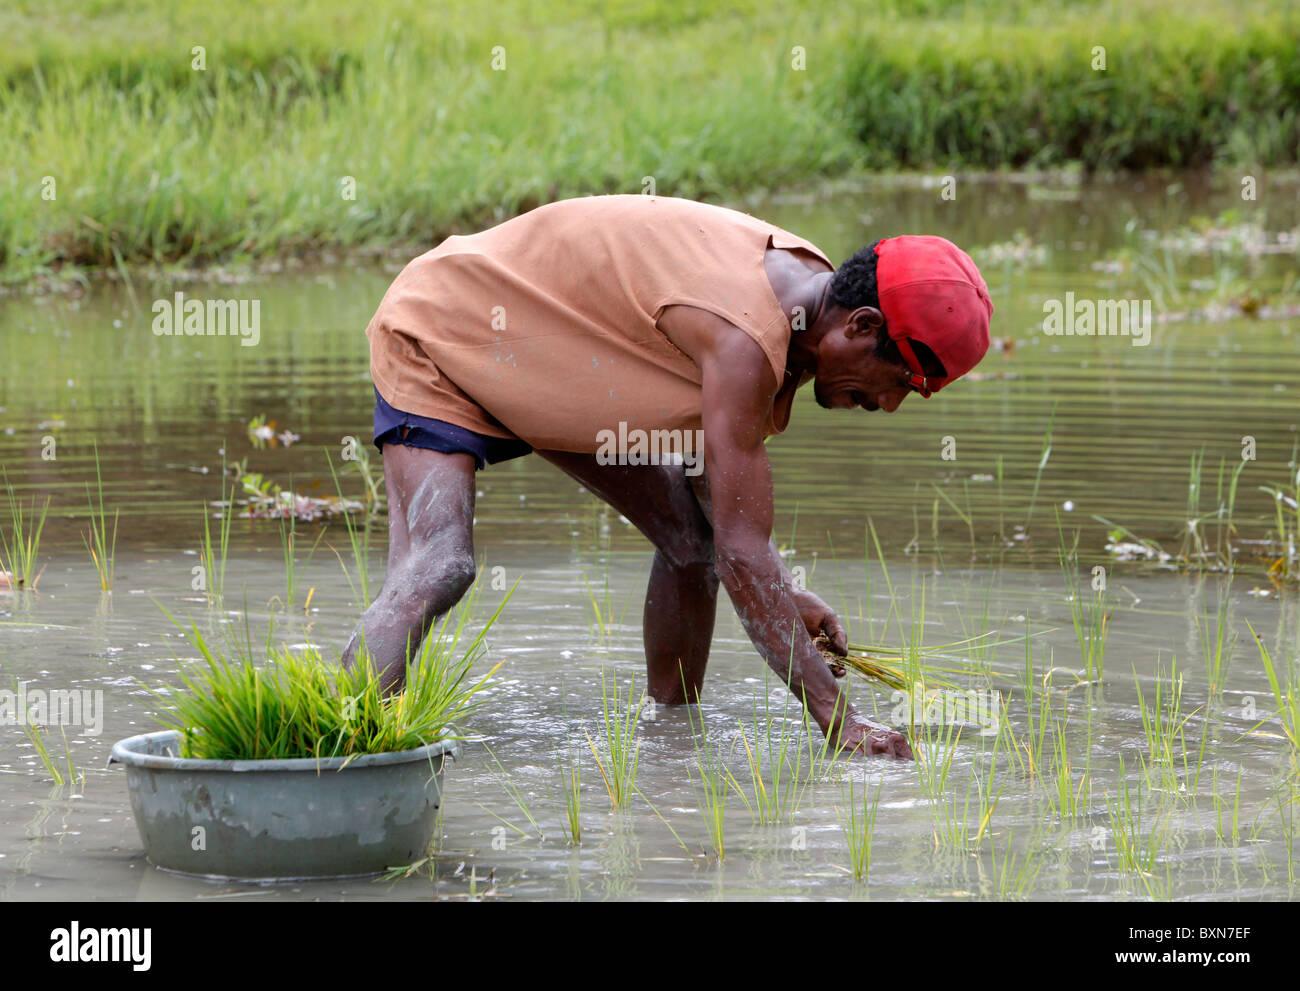 Farmer planting rice in a paddy field in Timor Leste (East Timor) - Stock Image